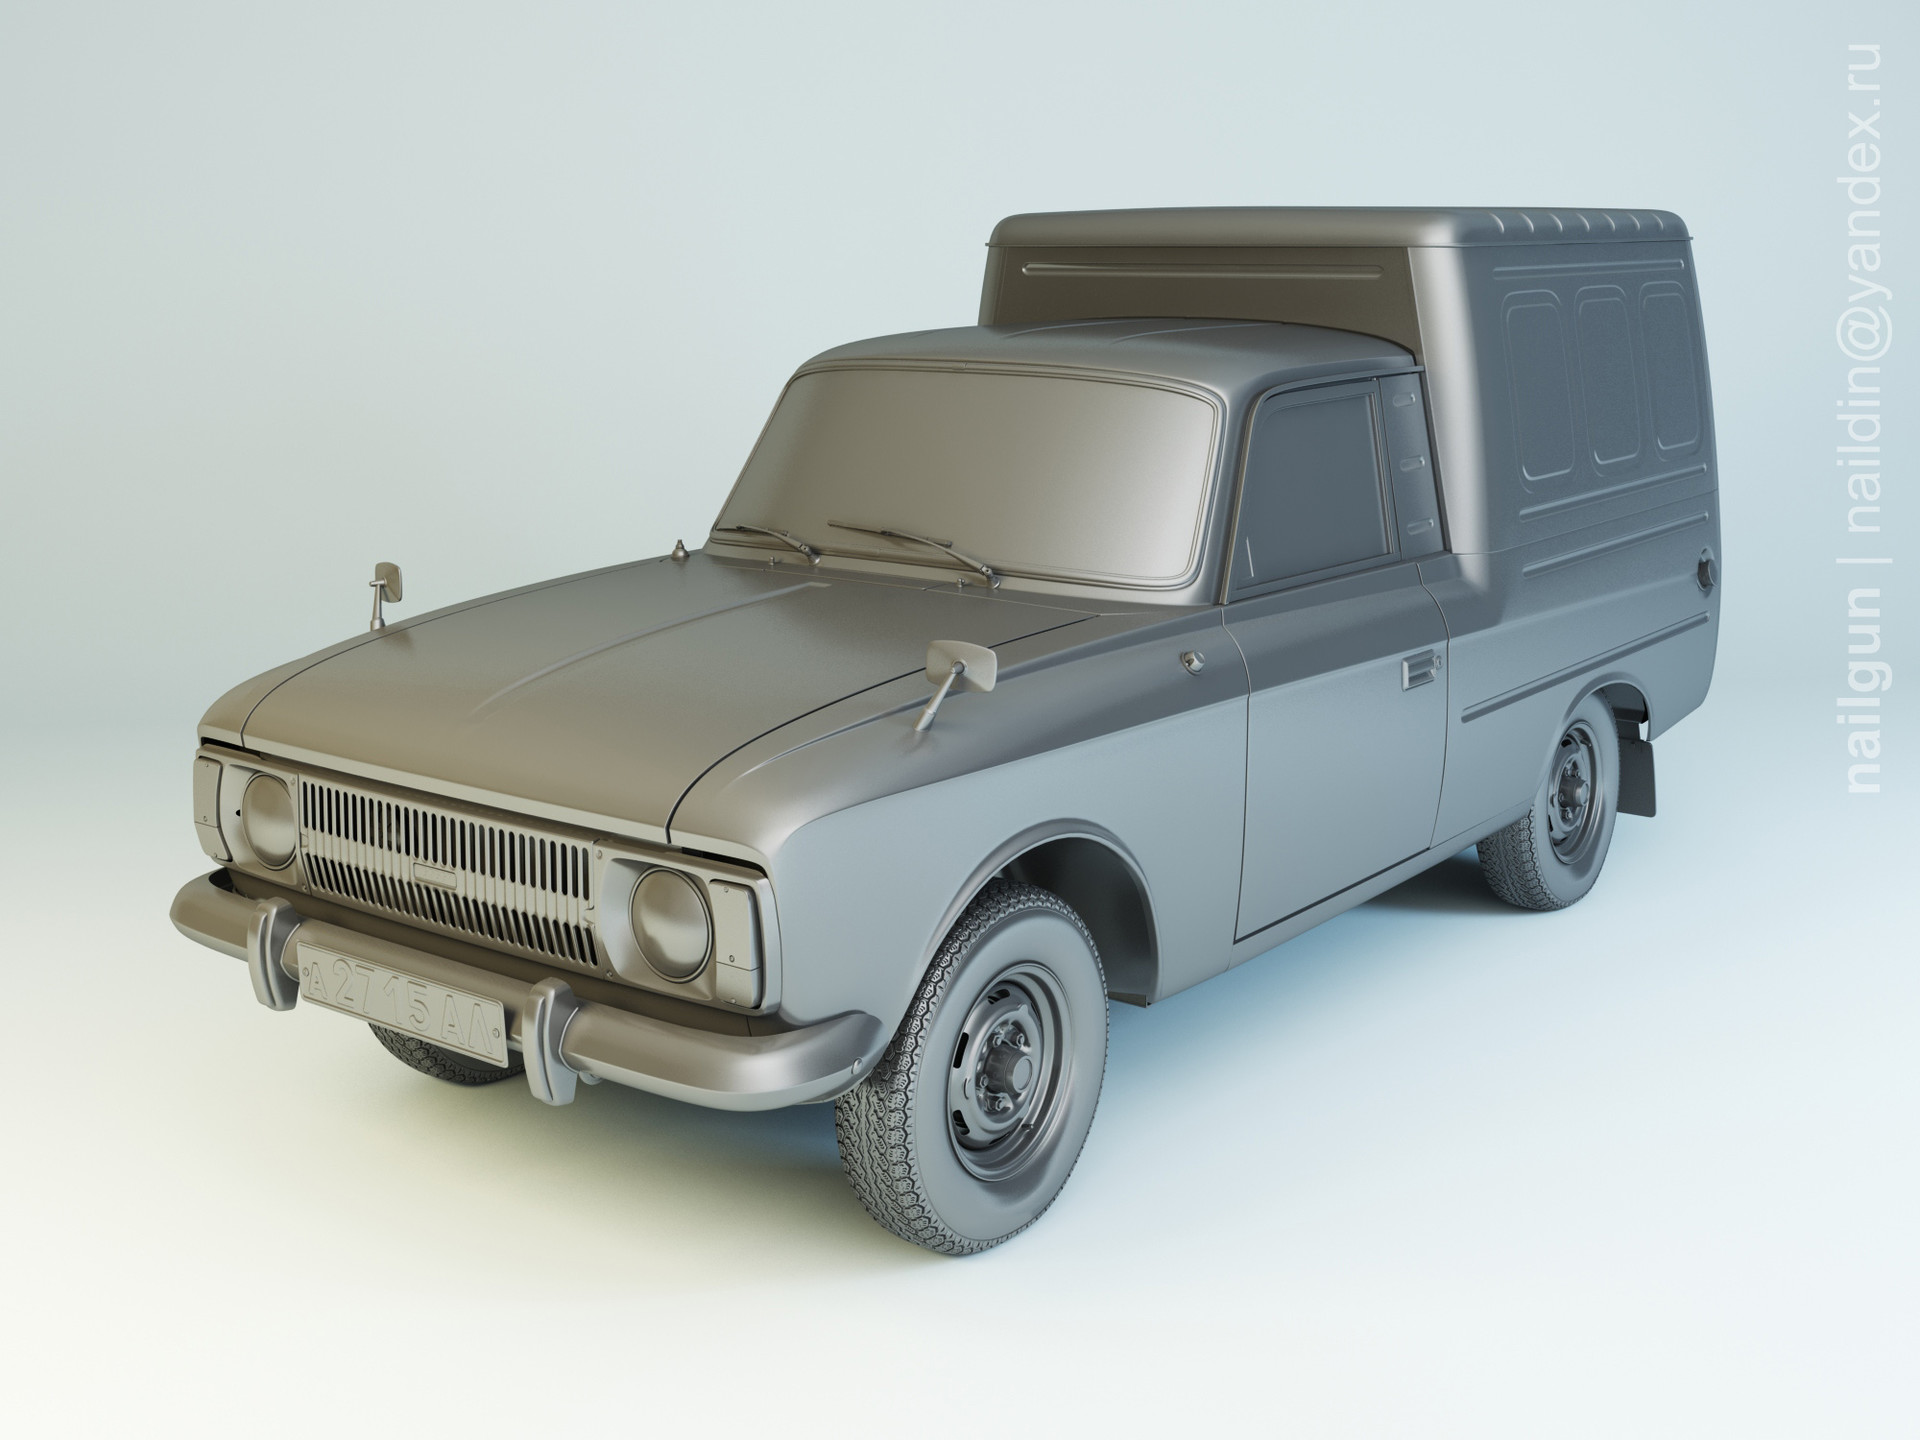 Nail khusnutdinov als 187 001 igh 2715 modelling 0